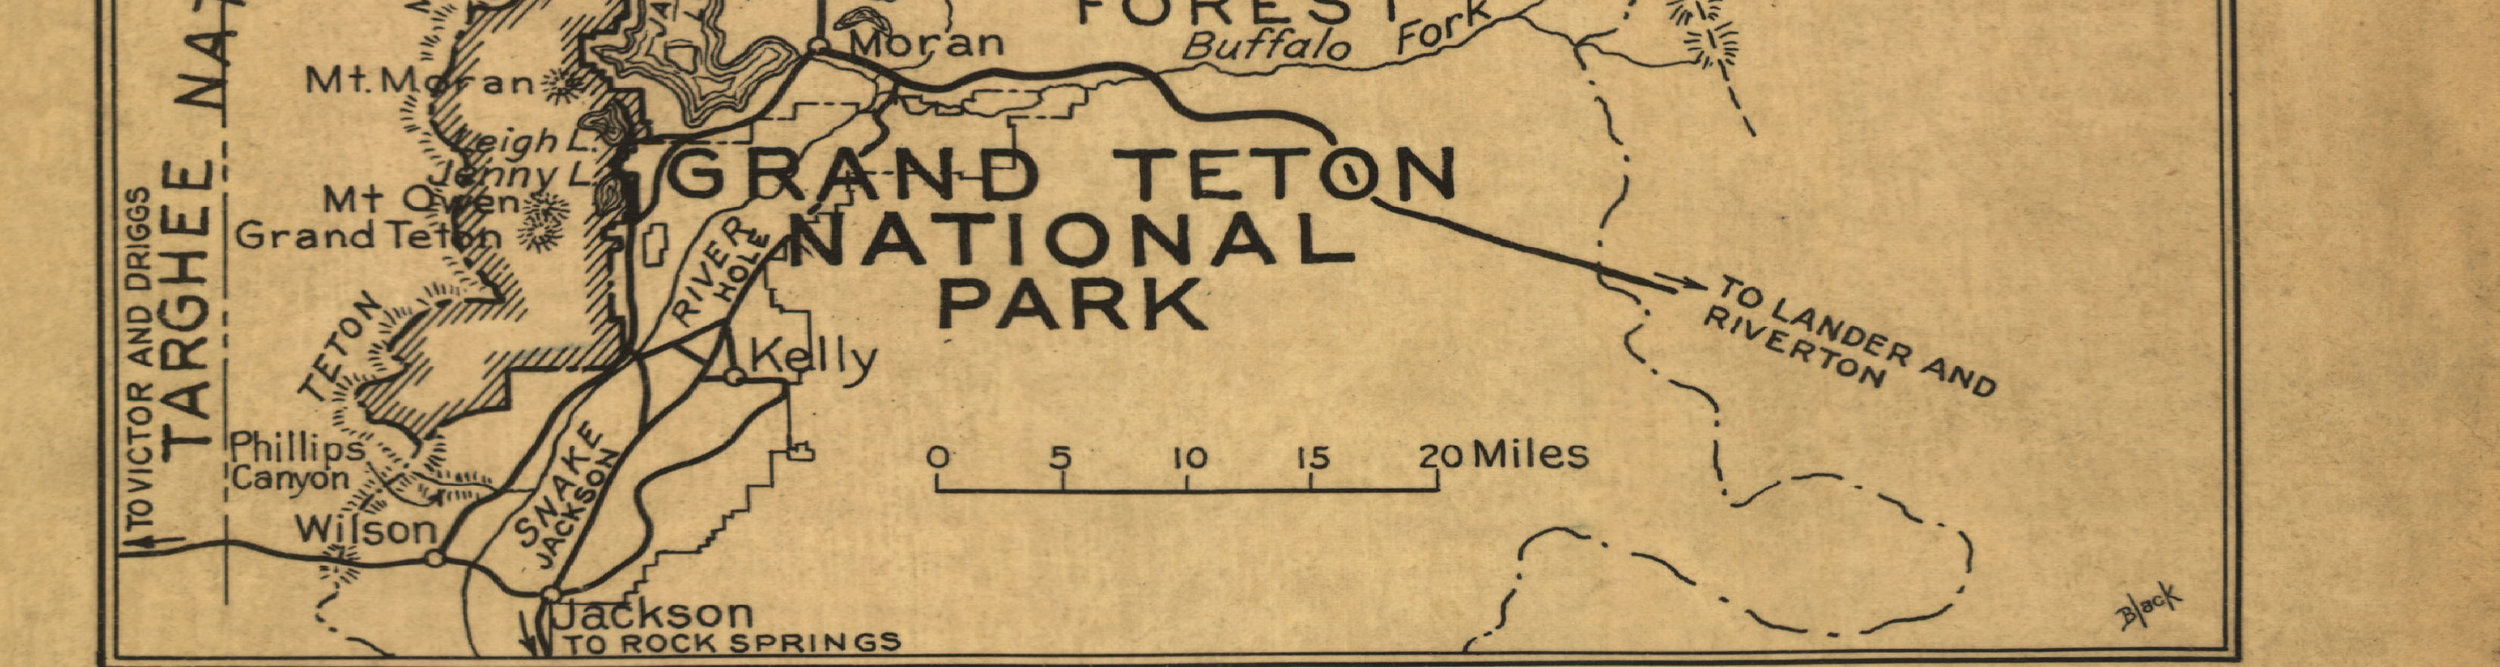 Yellowstone National Park Map 1929